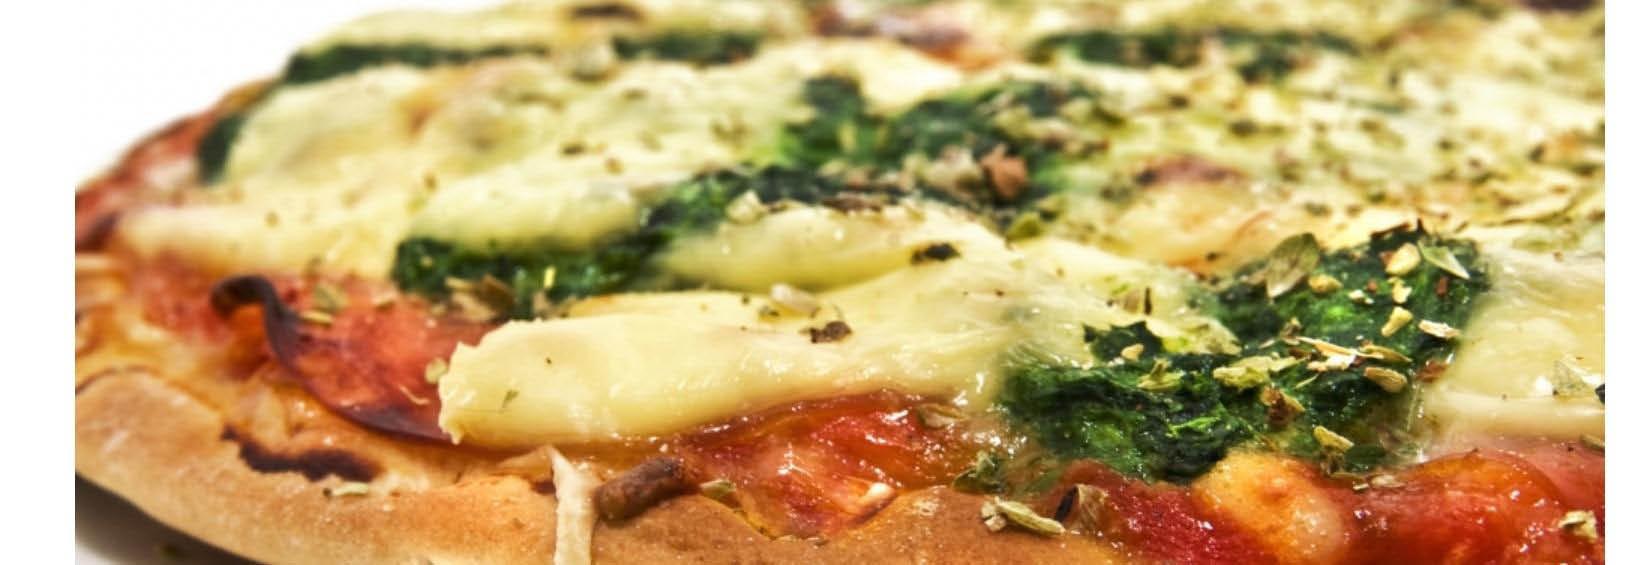 mimis-pizzeria-dallas-tx-banner